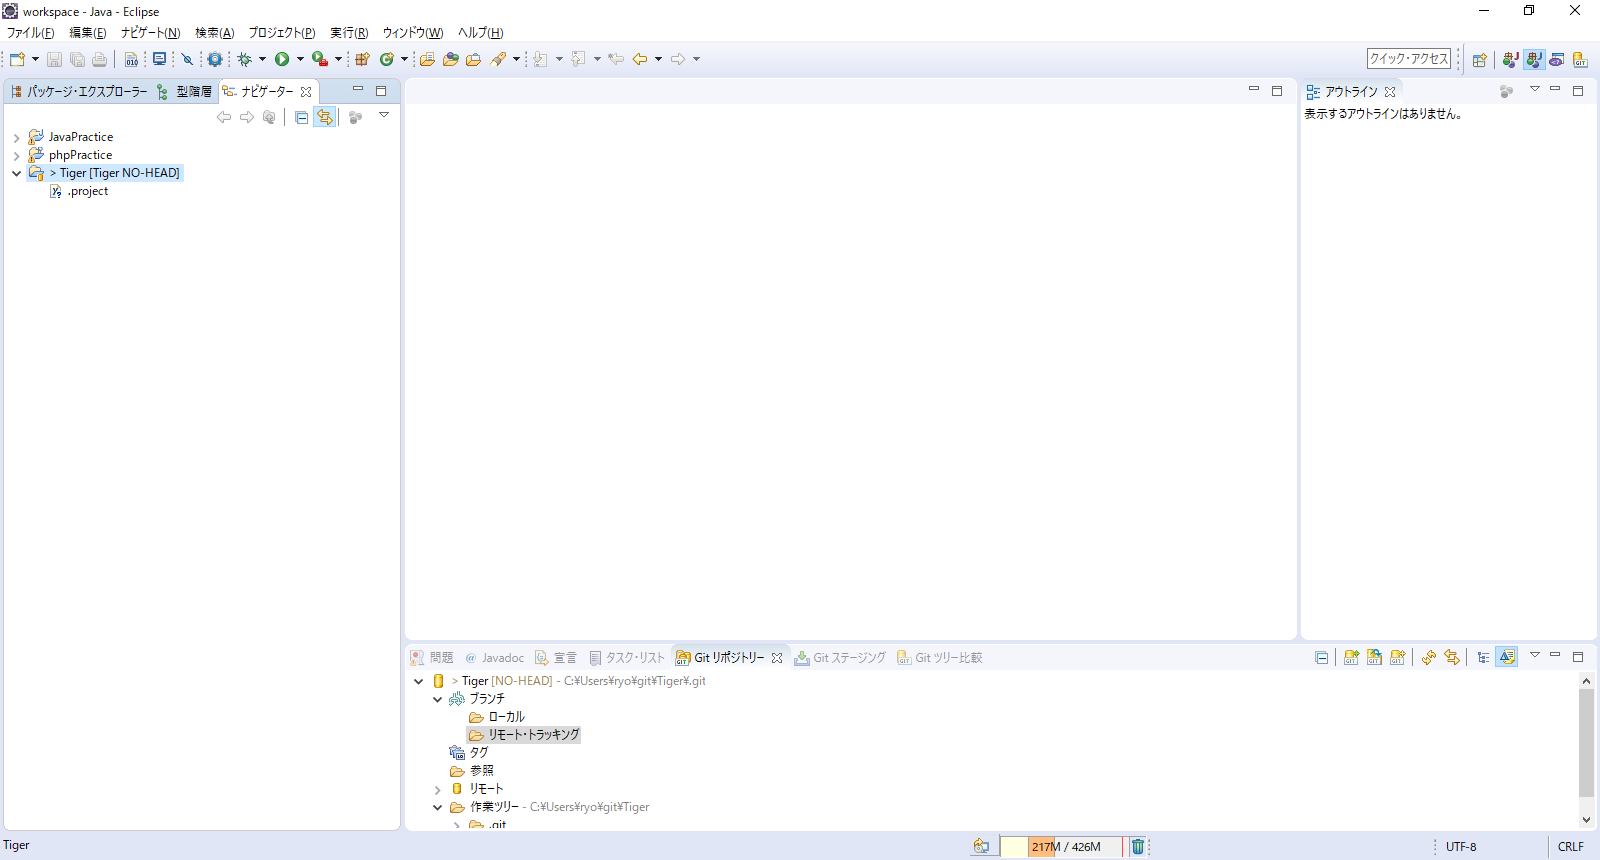 16_GitPJ_import.png